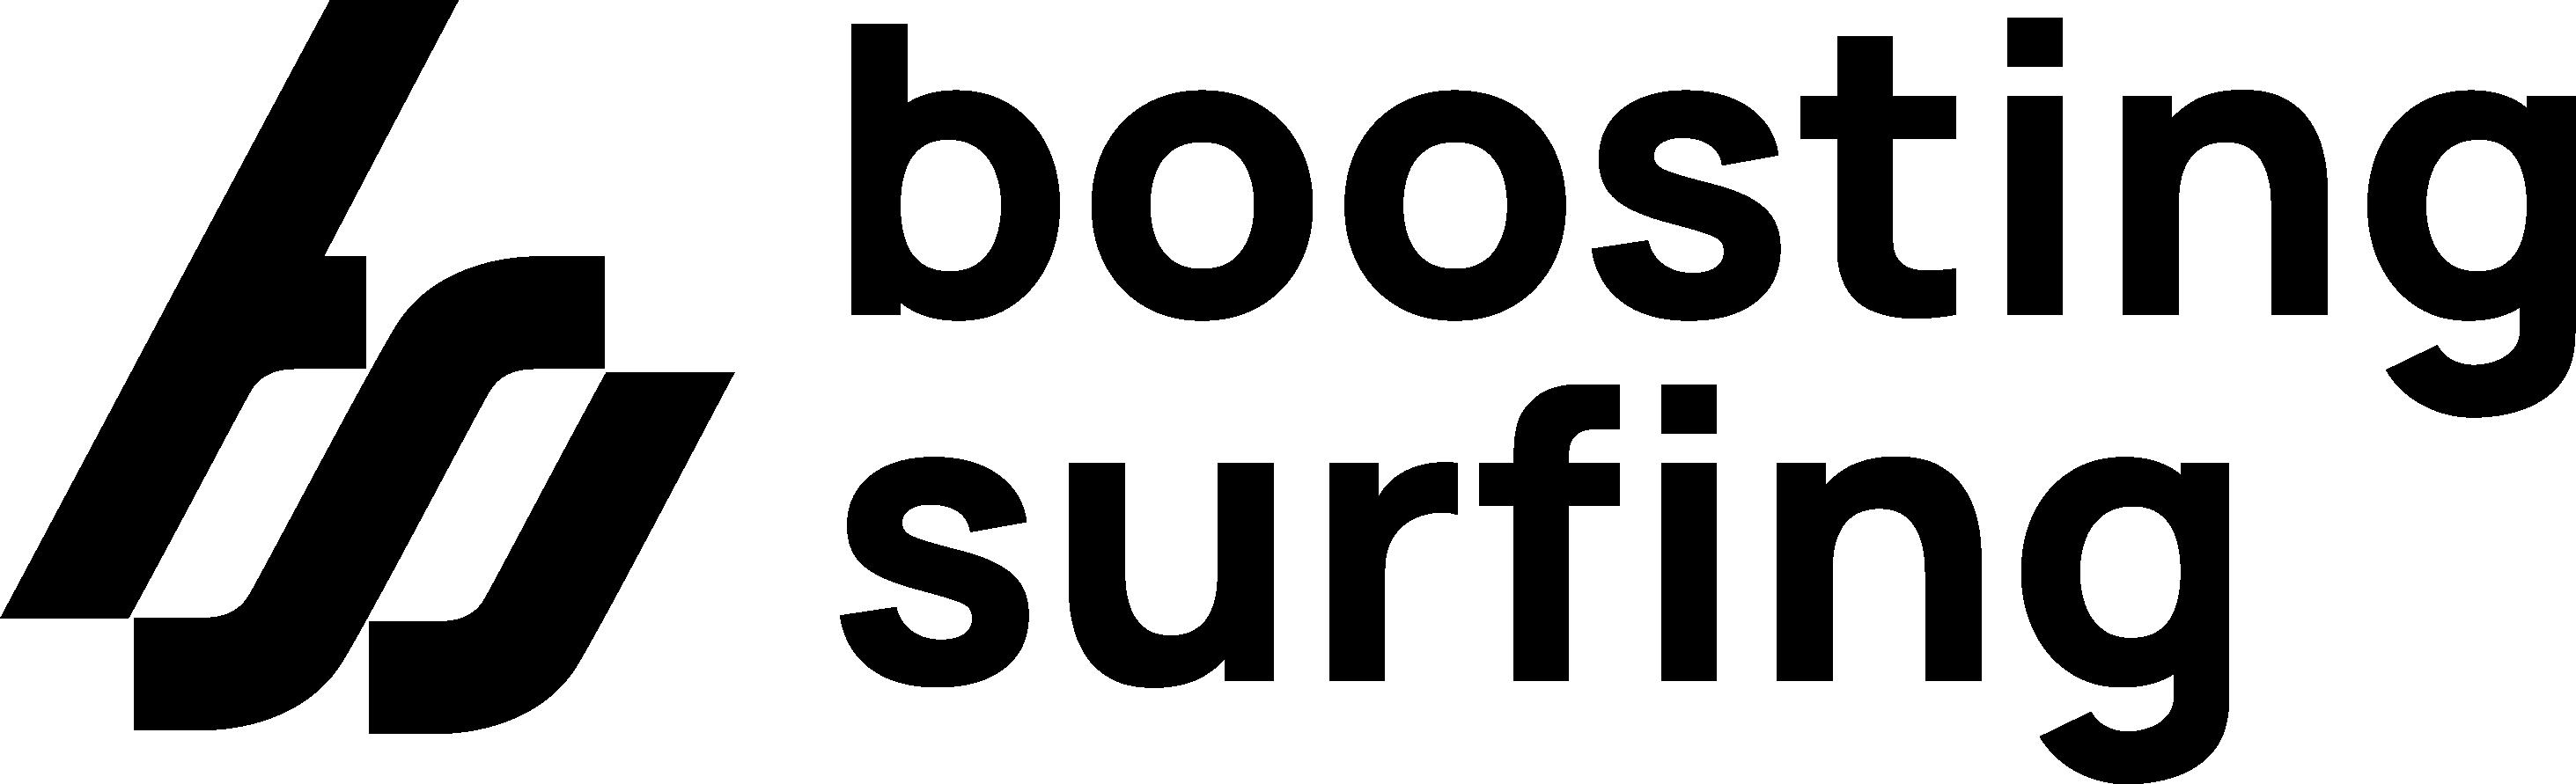 Boosting Surfing logo